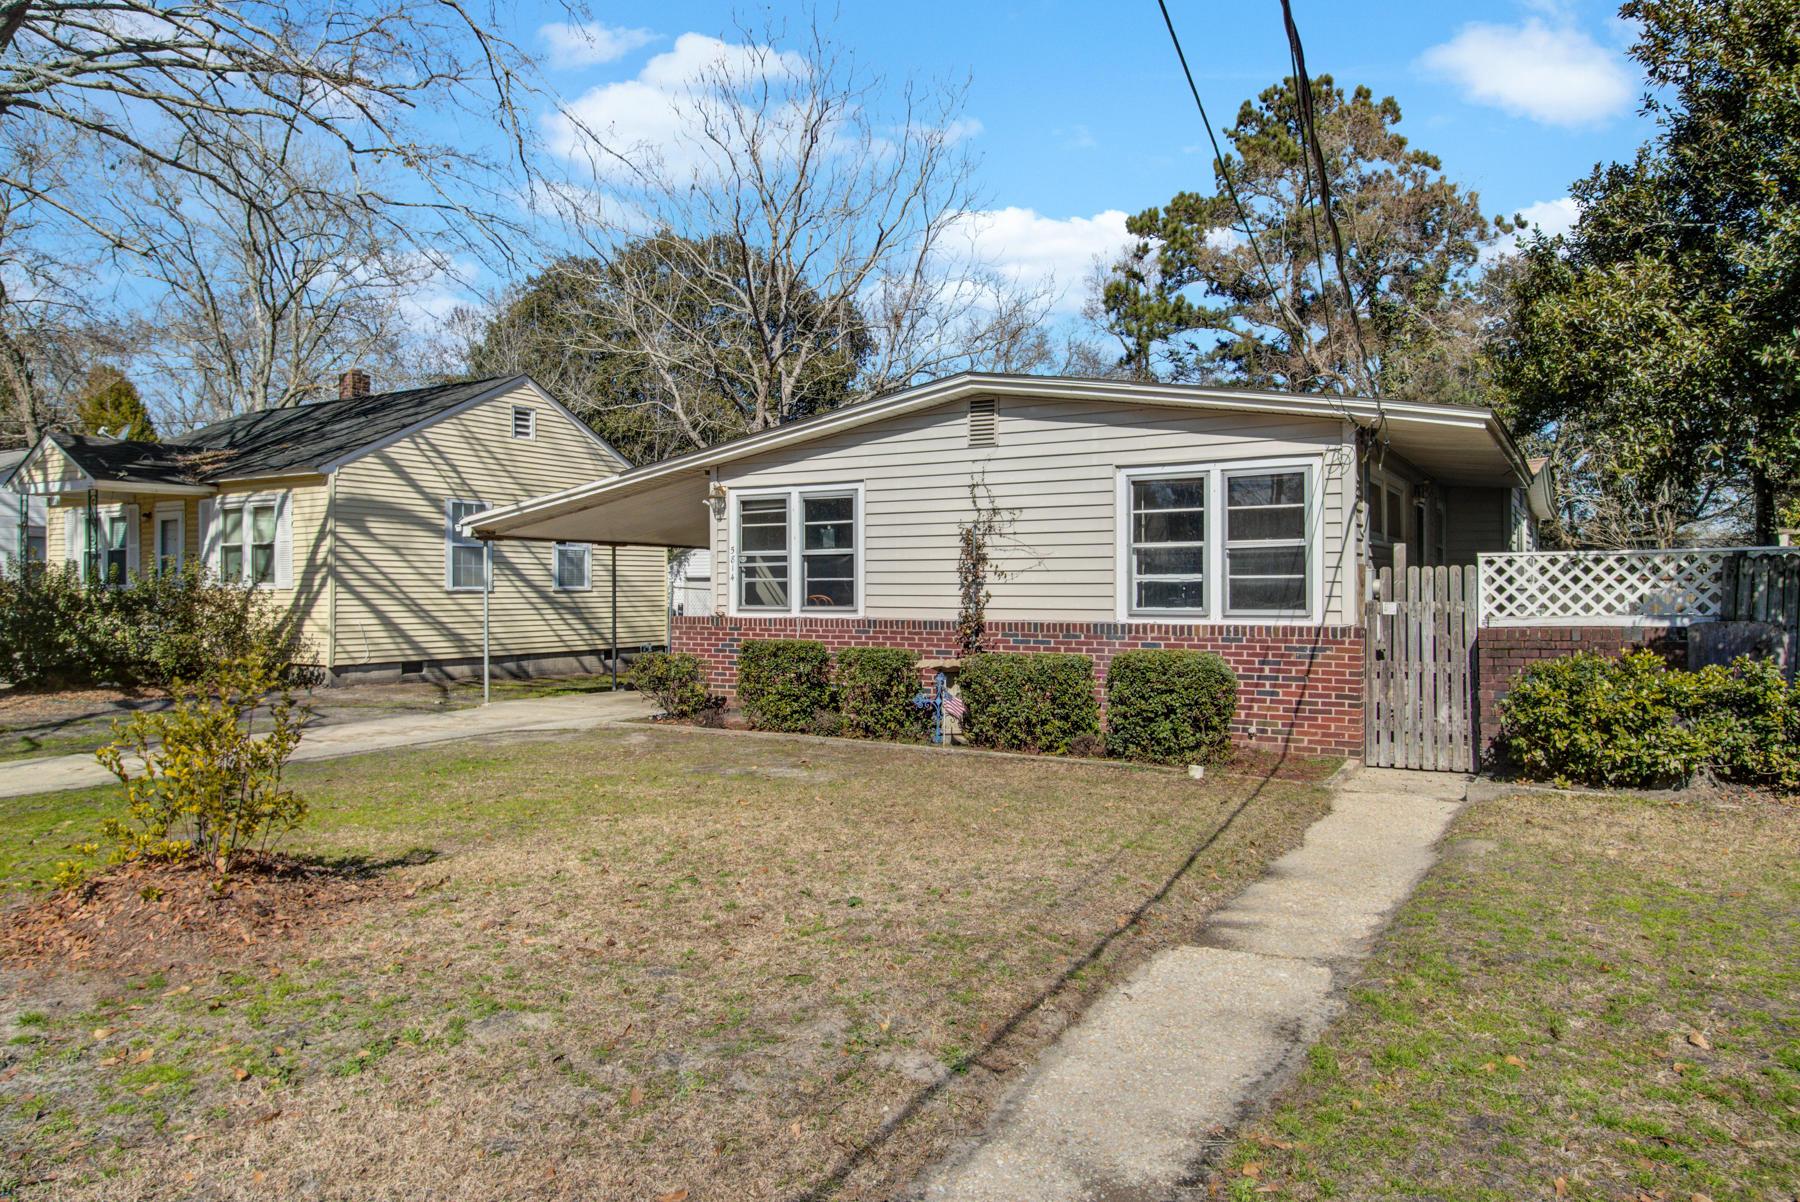 Port Park Homes For Sale - 5814 Moore, Hanahan, SC - 1